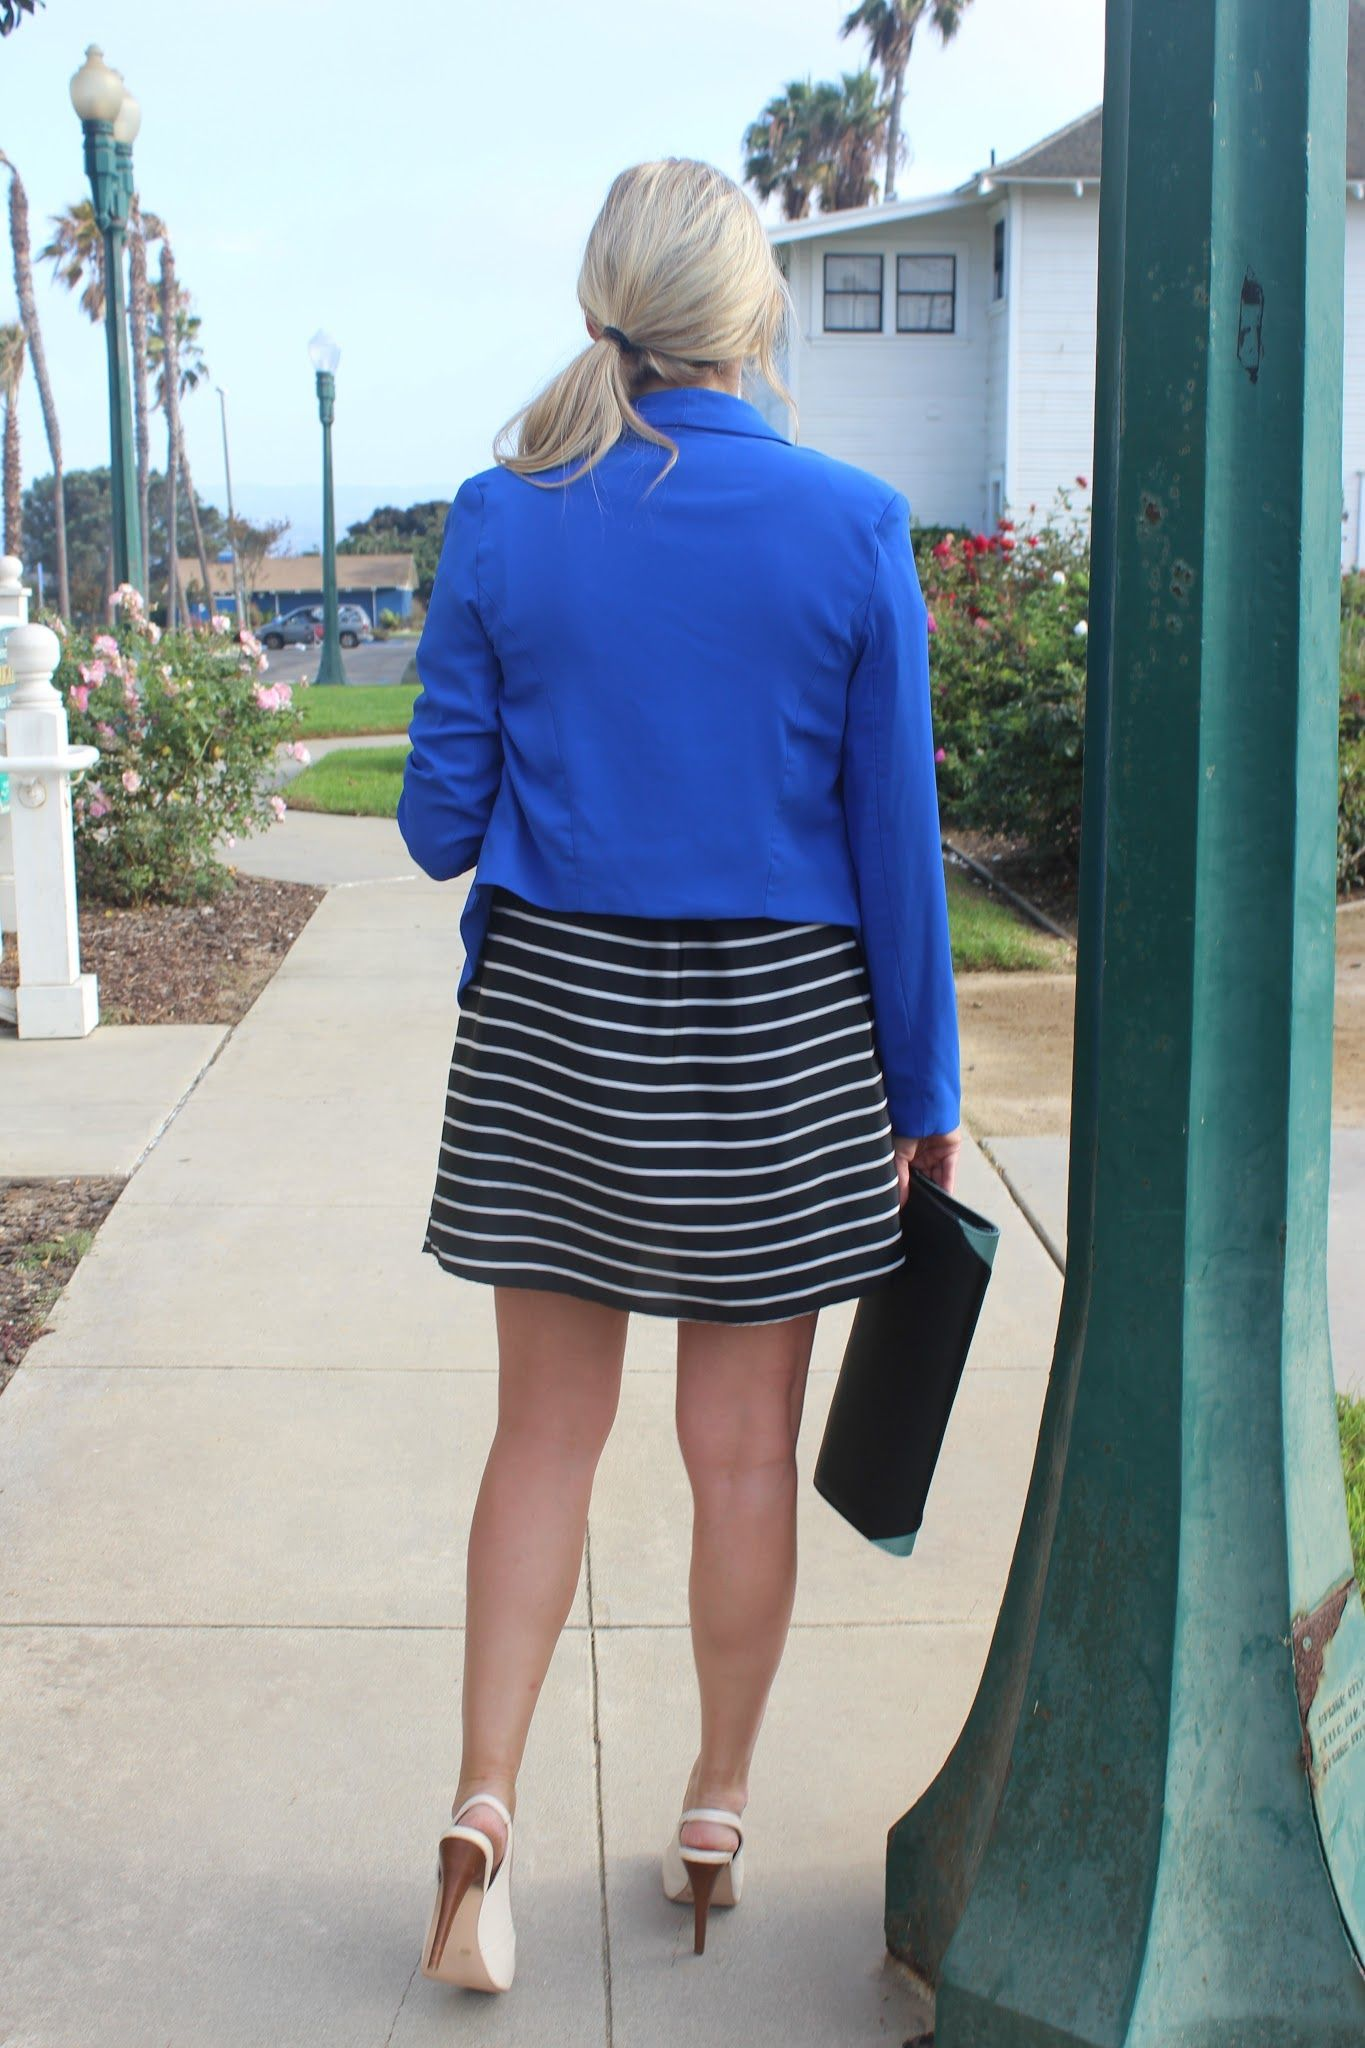 fd62f8bd4b44 Easy way to Dress Up a Striped Dress